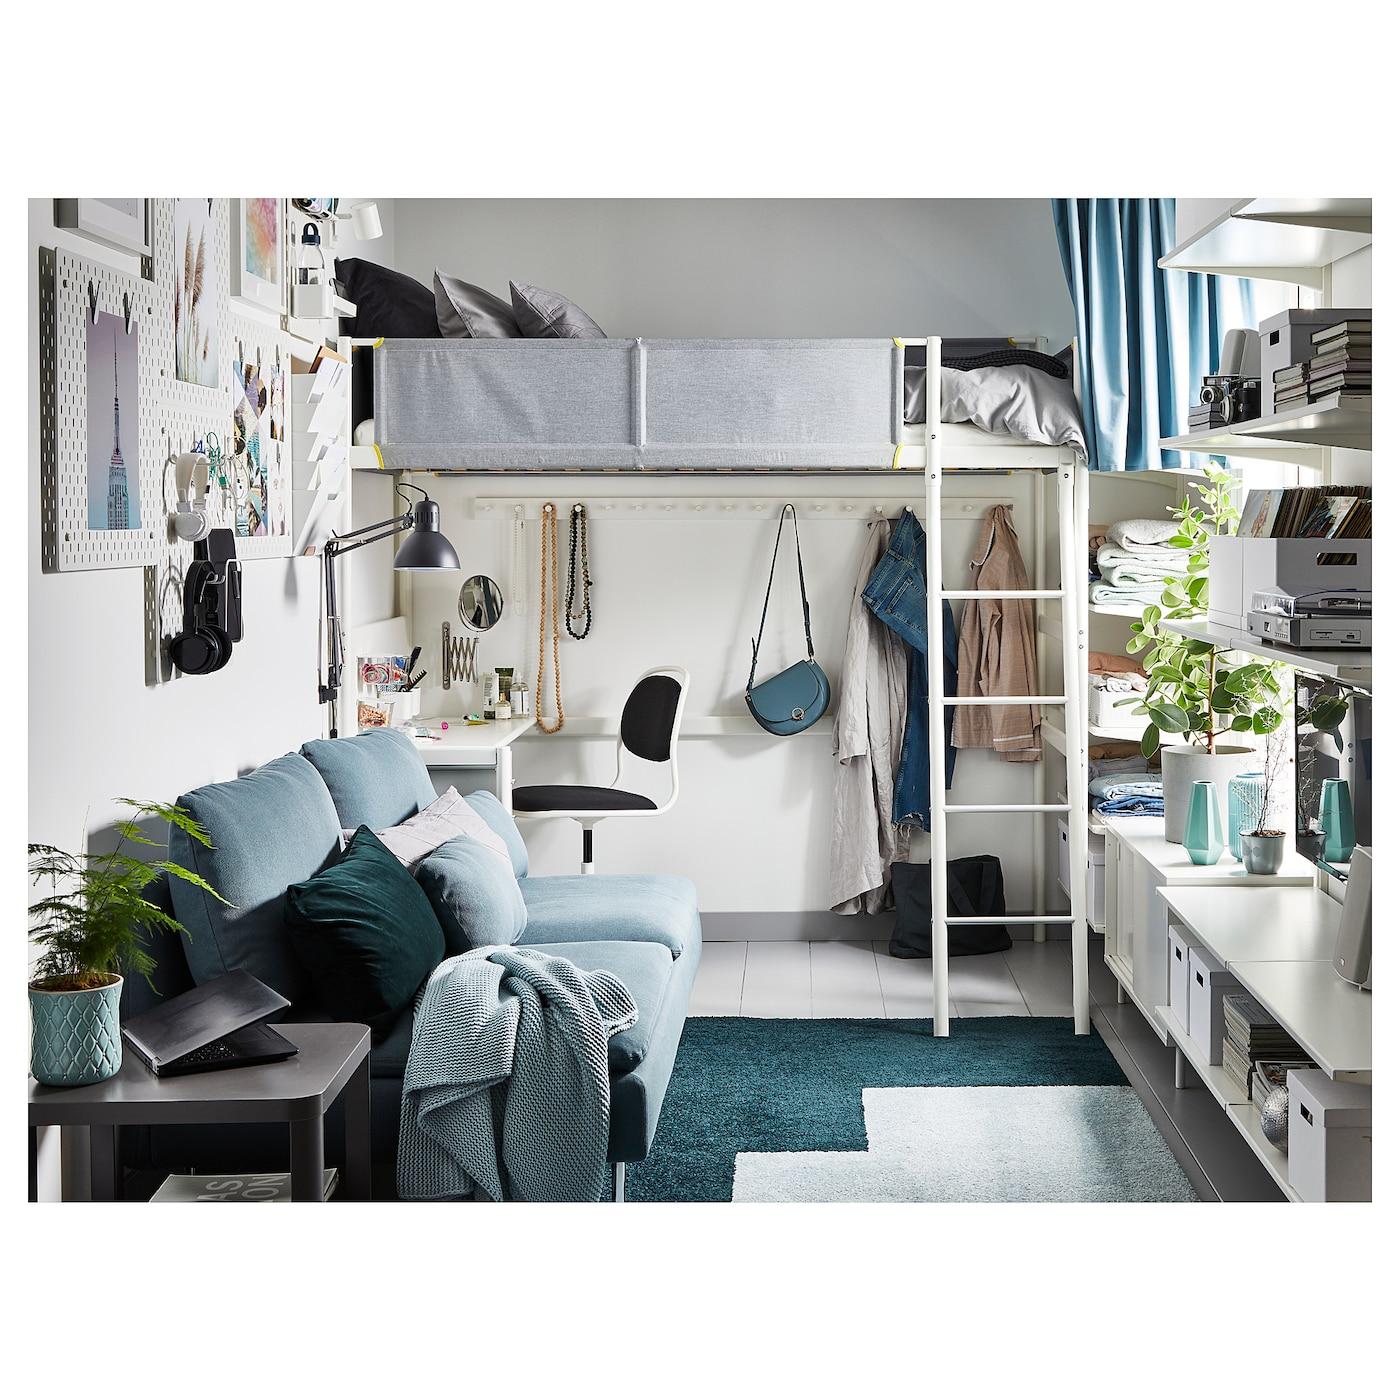 decoracion habitacion con litera lata de ikea